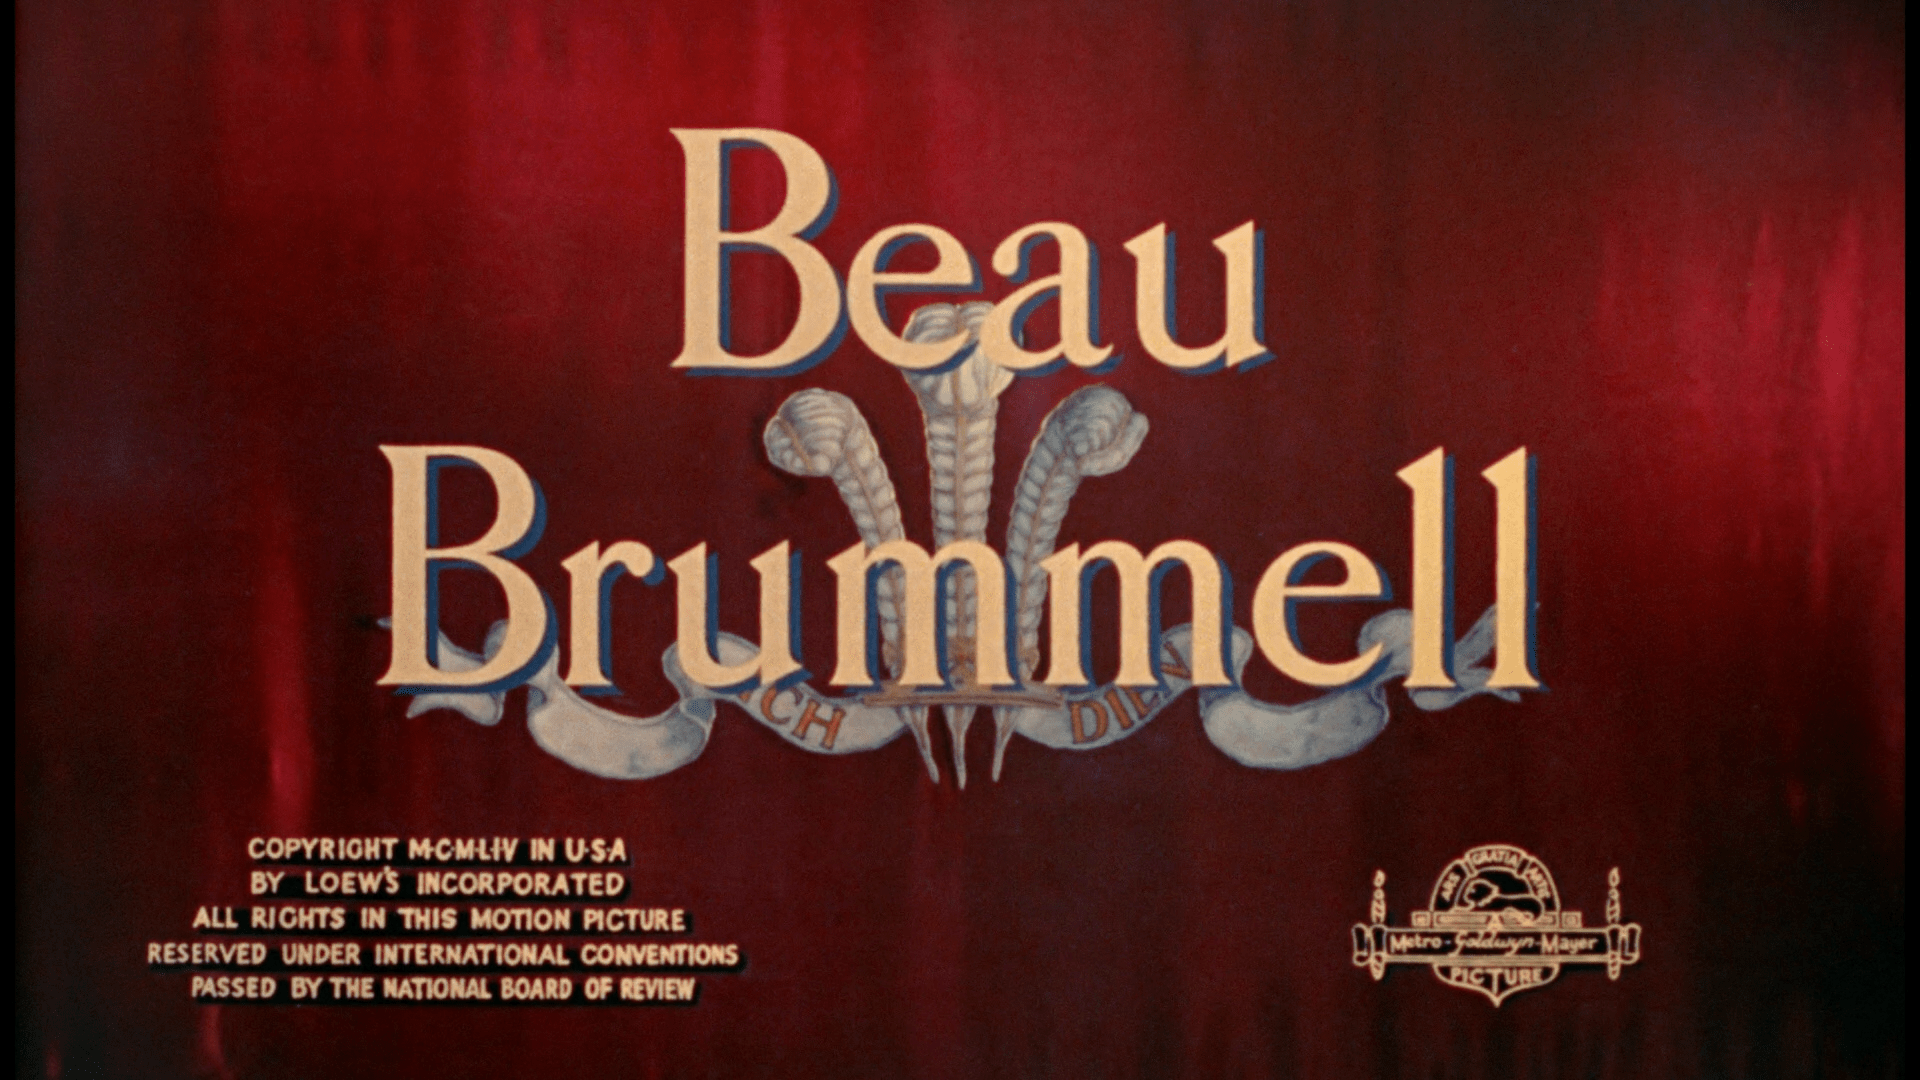 Beau Brummell Warner Archive blu-ray title